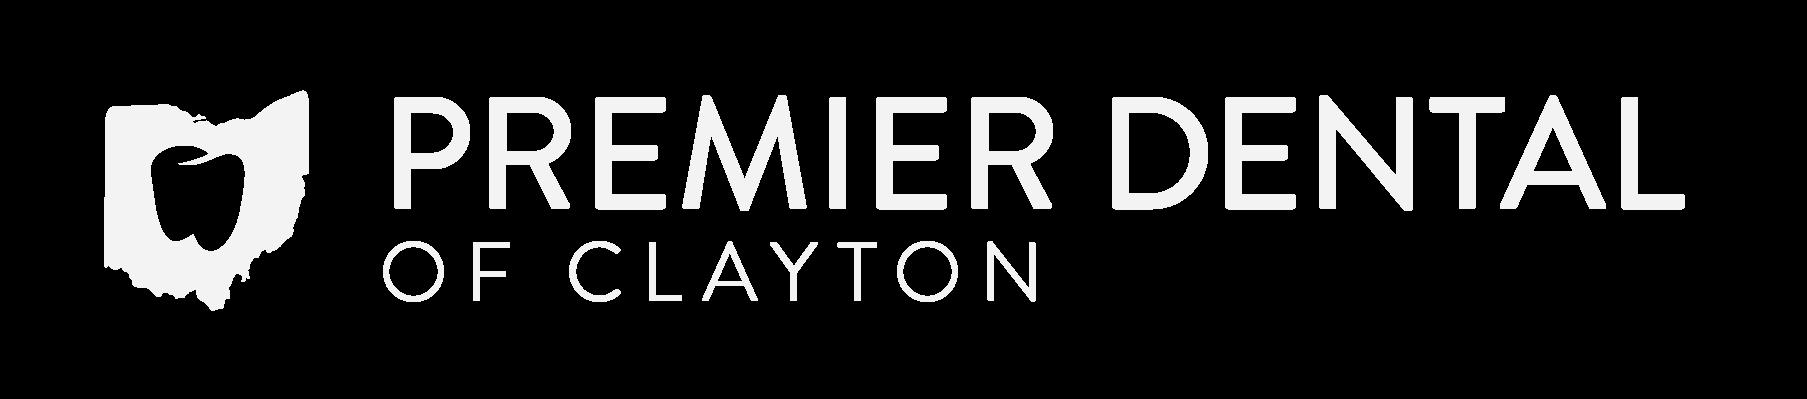 Premier Dental of Clayton